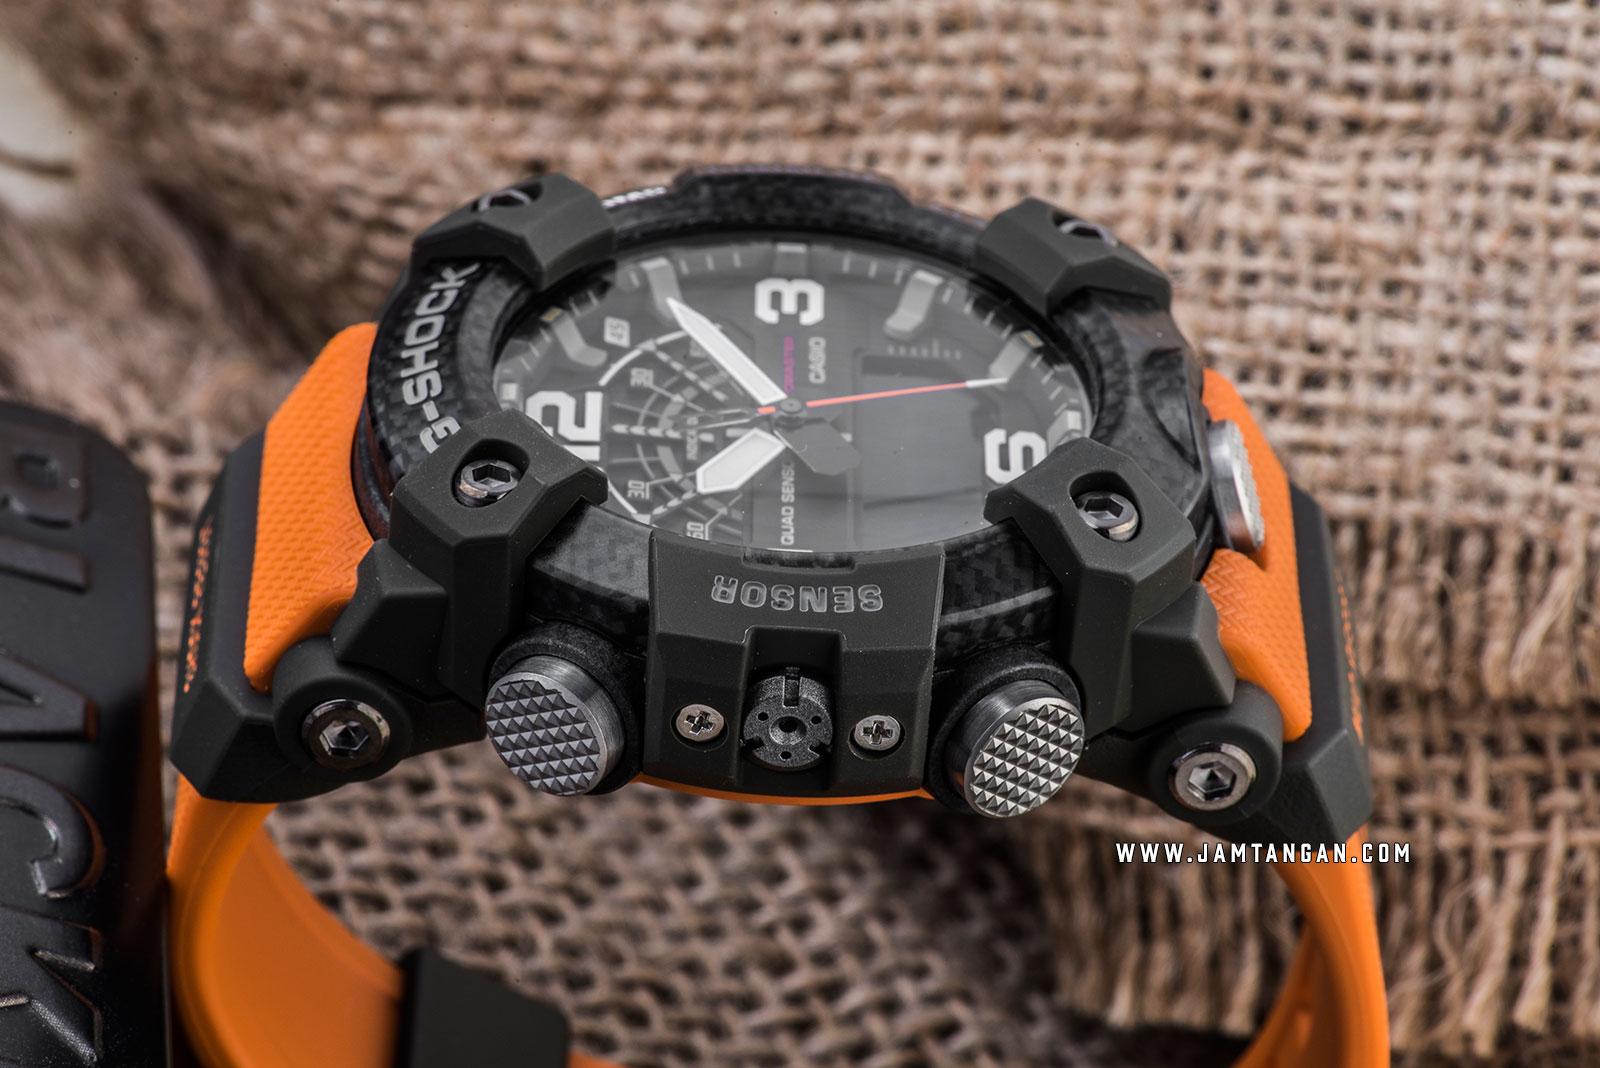 Casio G-Shock GG-B100-1A9JF Mudmaster Digital Analog Dial Orange Resin Strap Machtwatch